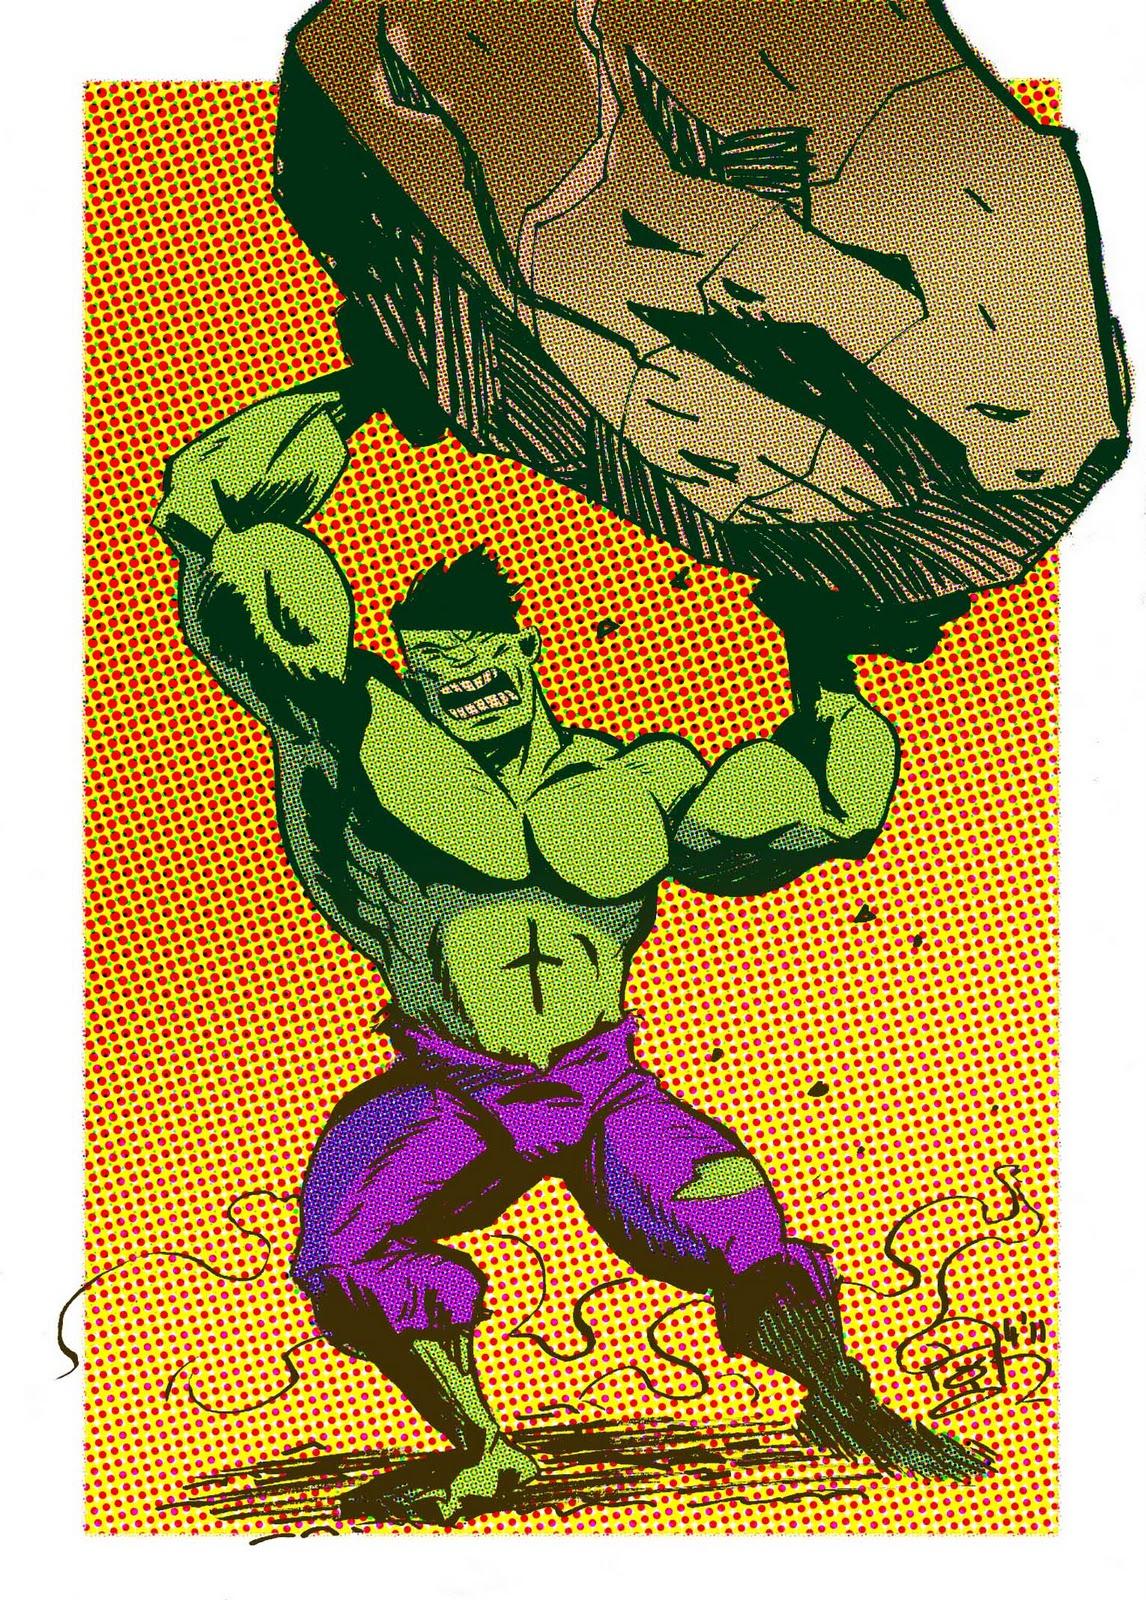 angry hulk throwing rocks - photo #3